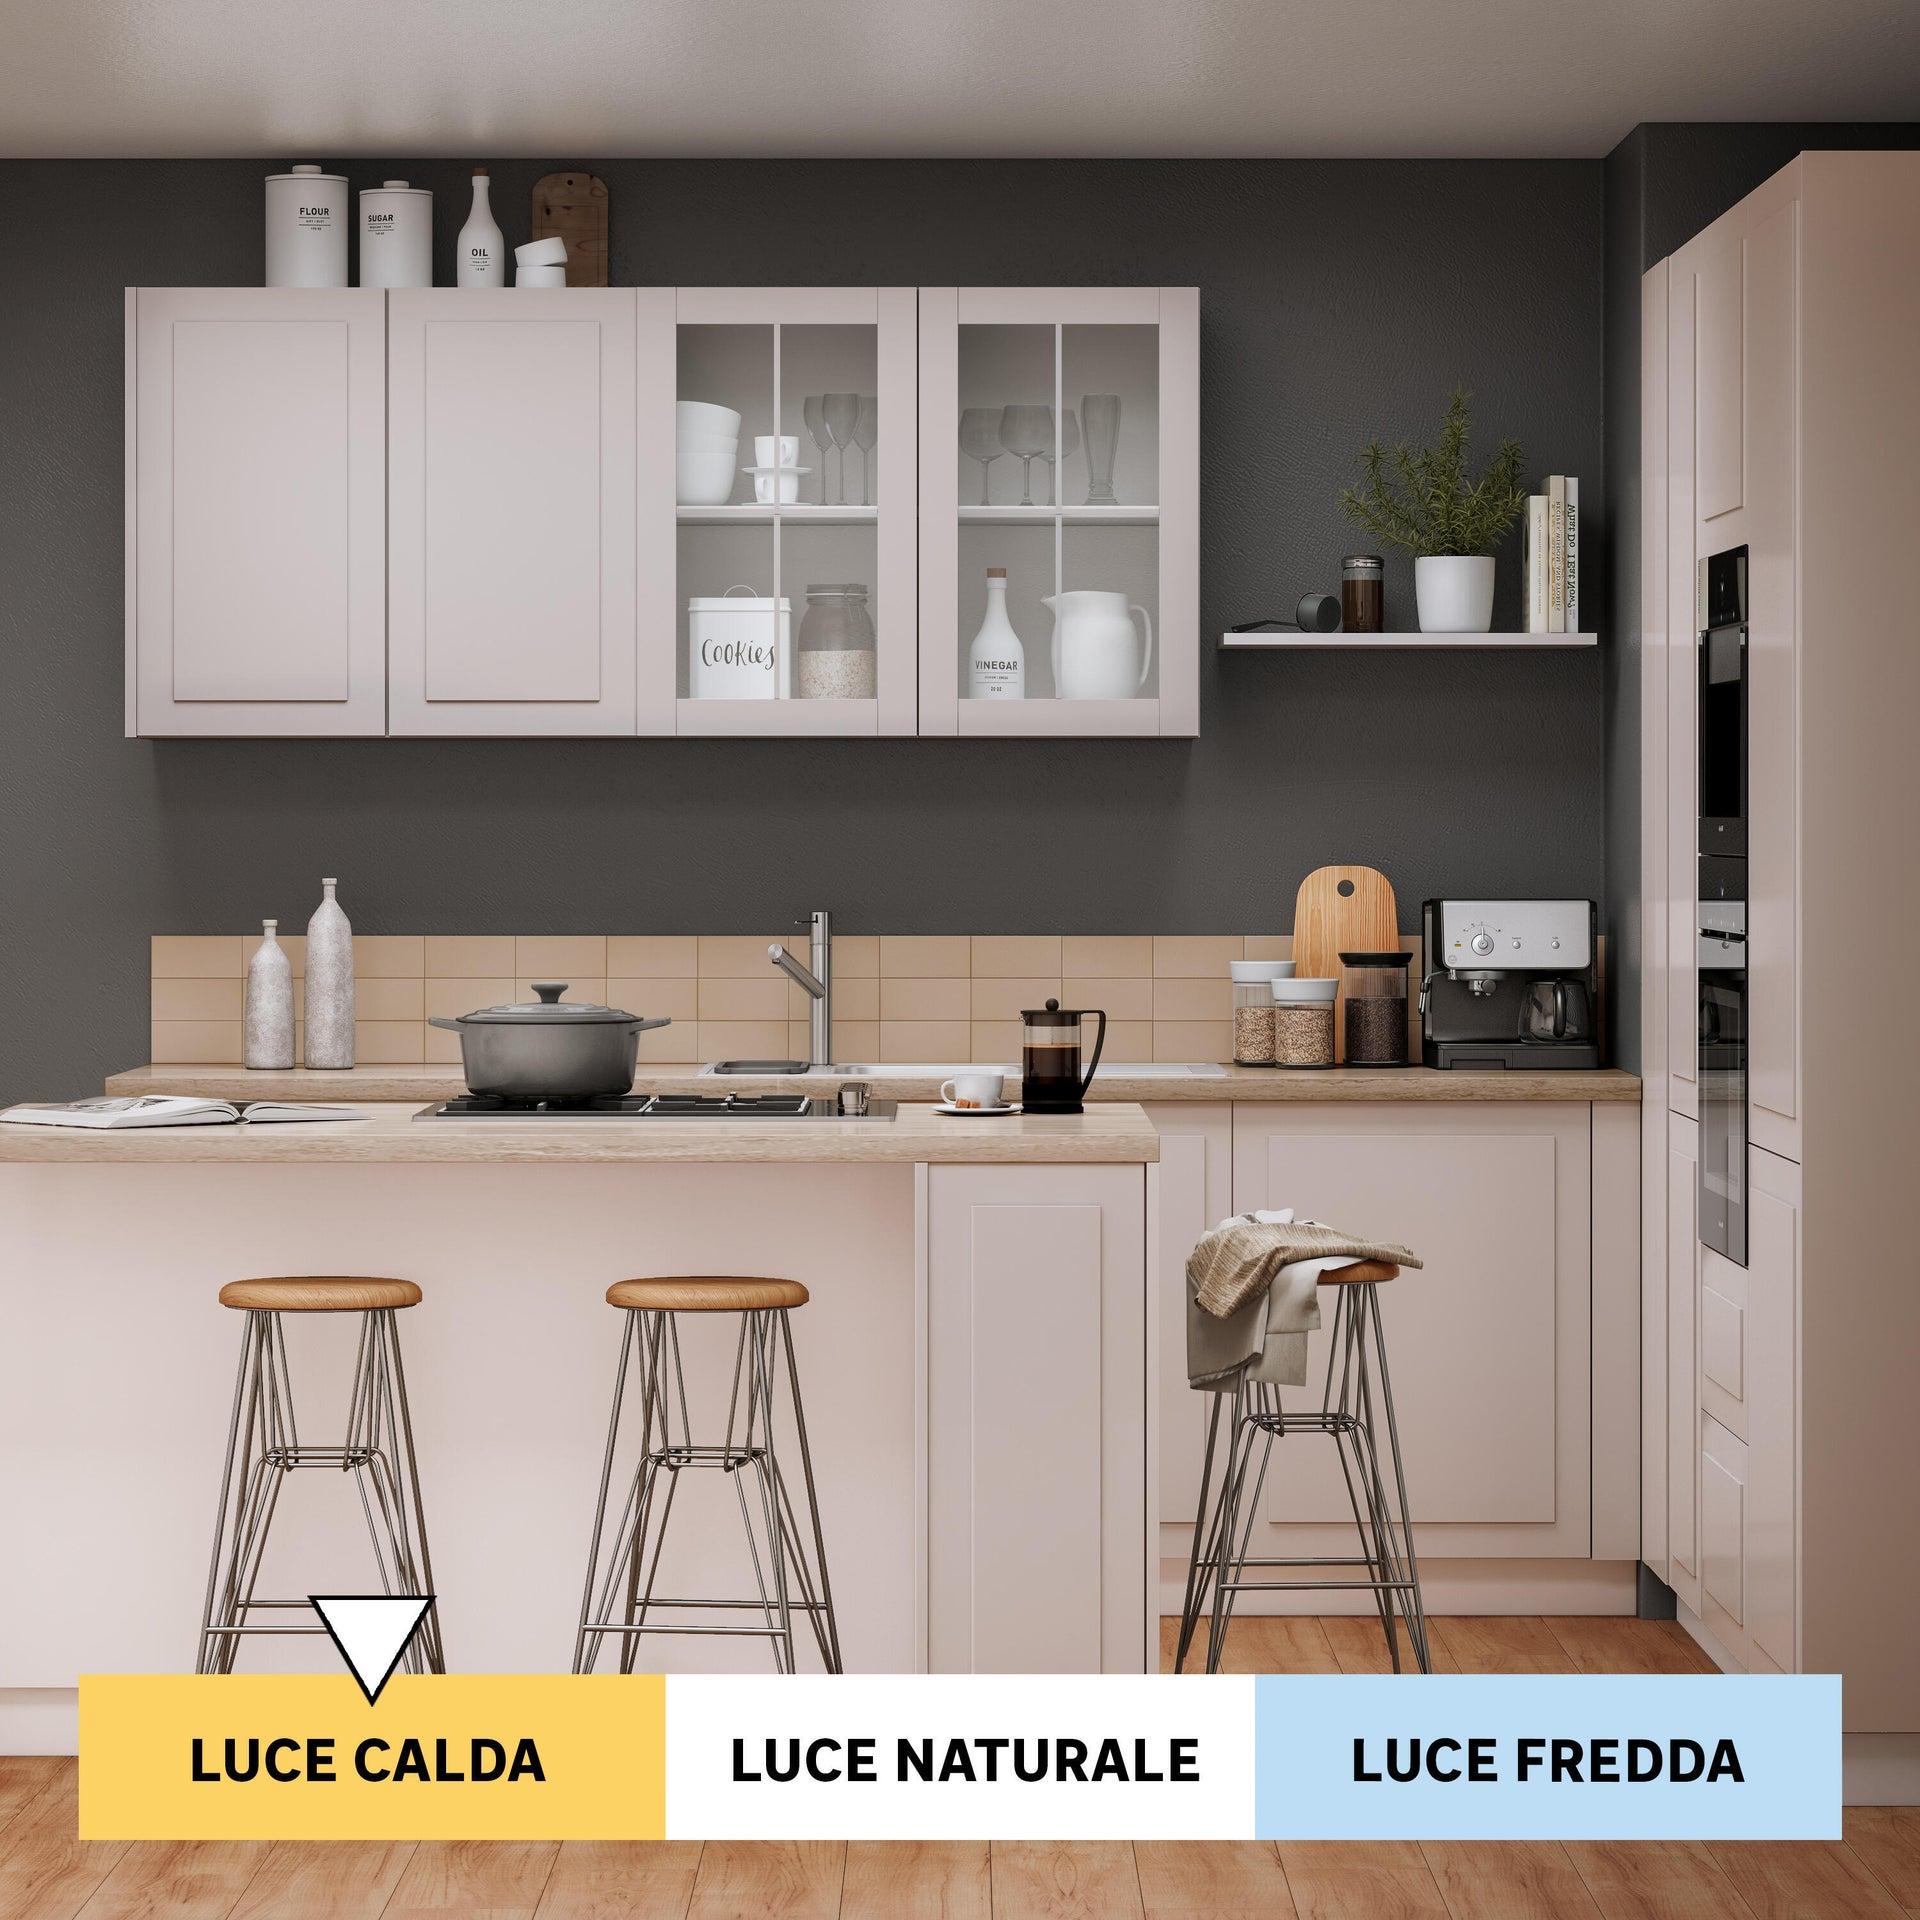 Lampadina smart lighting LED filamento, E27, Goccia, Fumé, Luce calda, 7W=600LM (equiv 7 W), 360° - 2